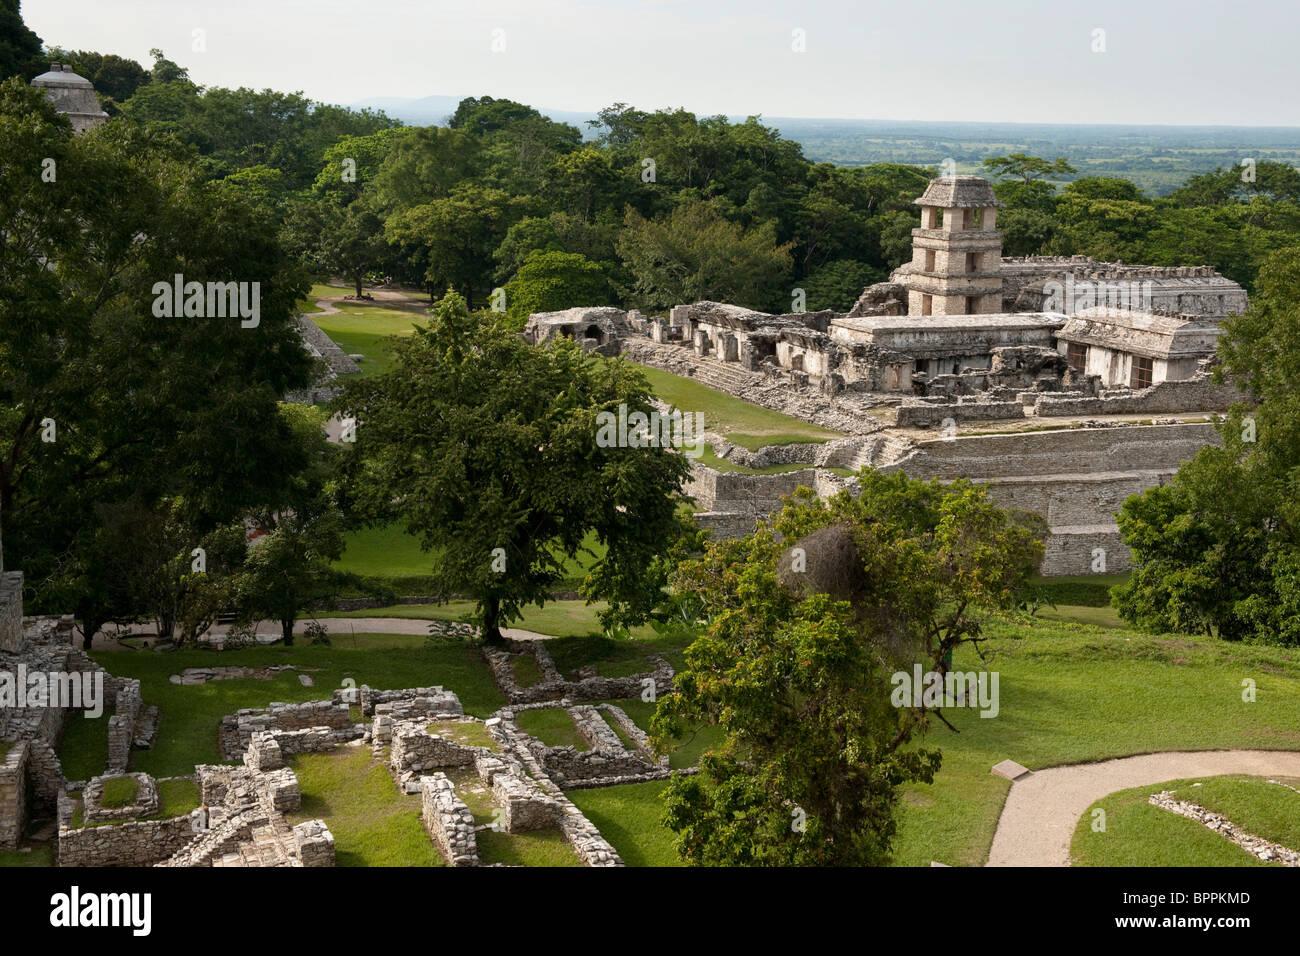 The Palace, Maya ruins of Palenque, Mexico - Stock Image